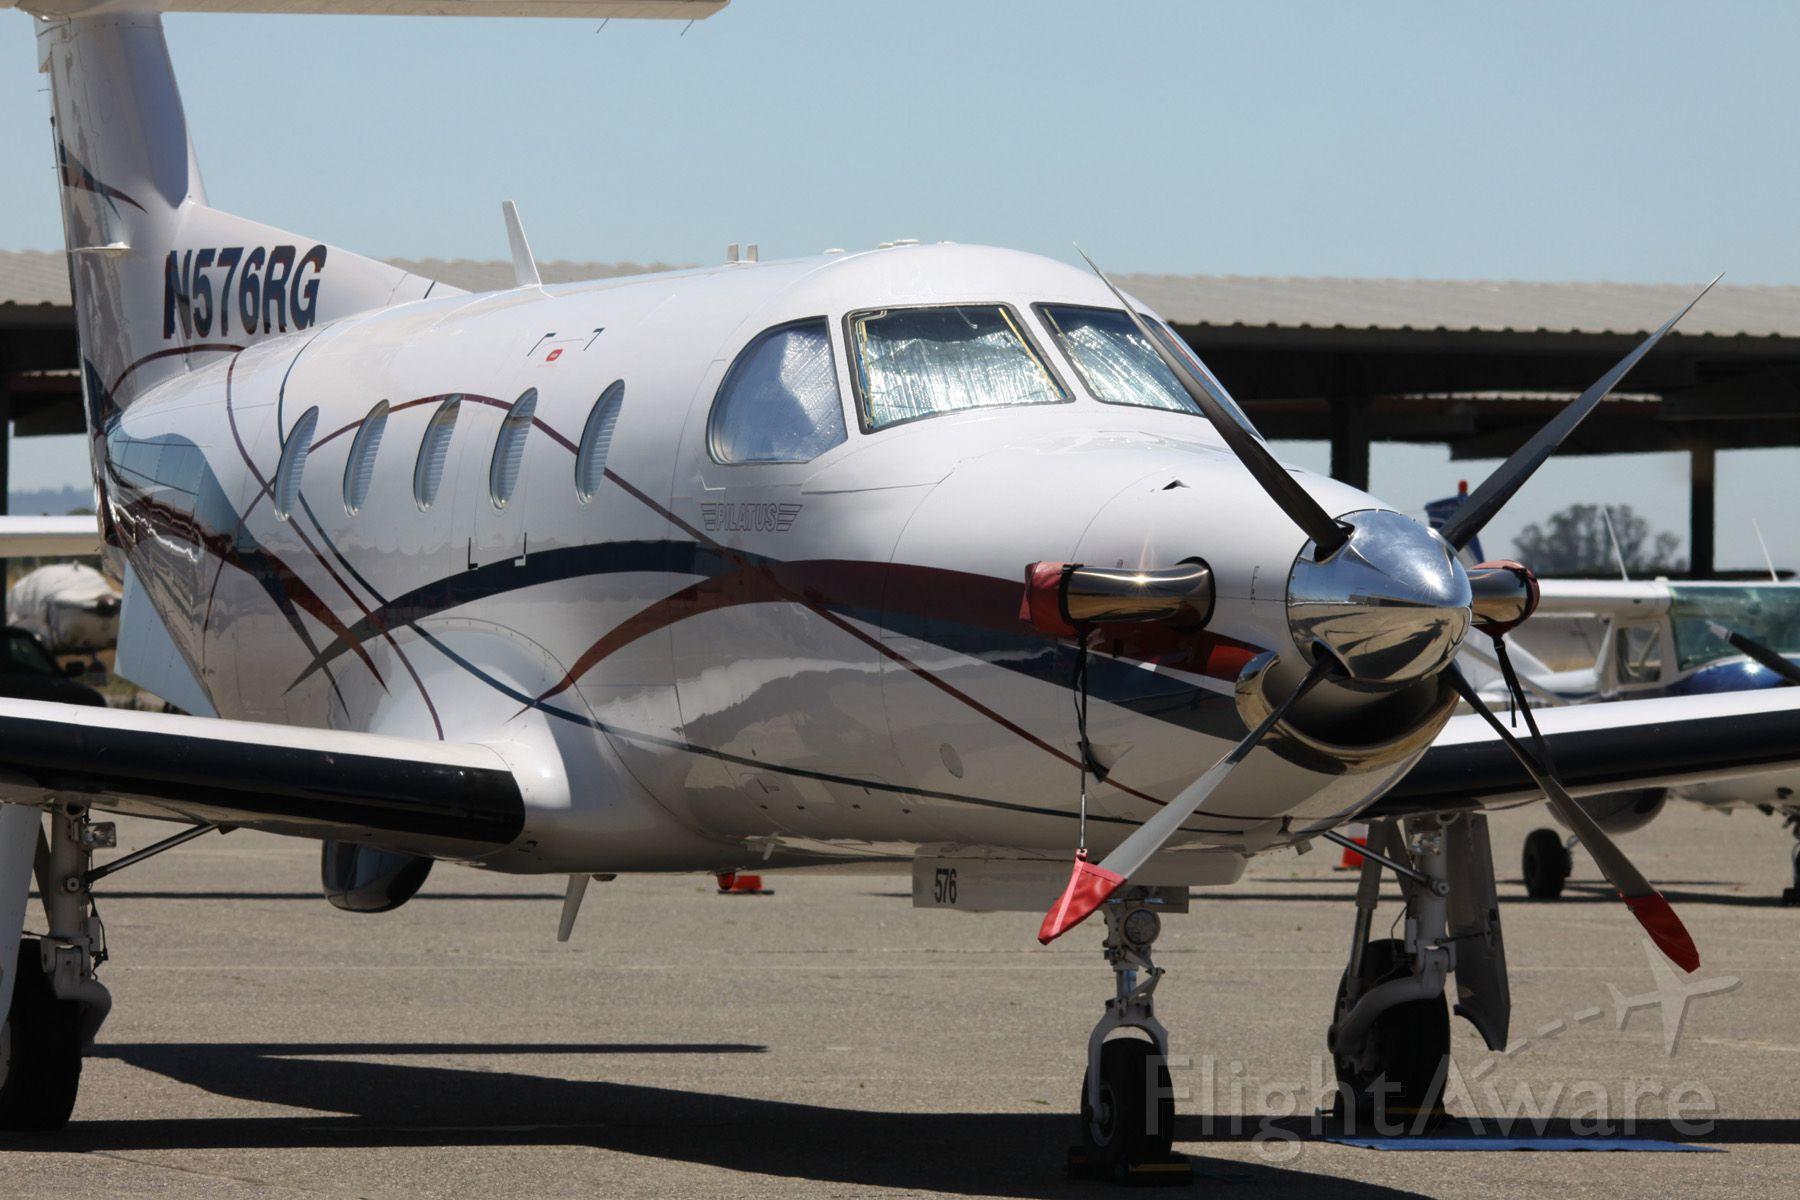 Pilatus PC-12 (N576RG) - Parked, awaiting a flight  06-22-2015